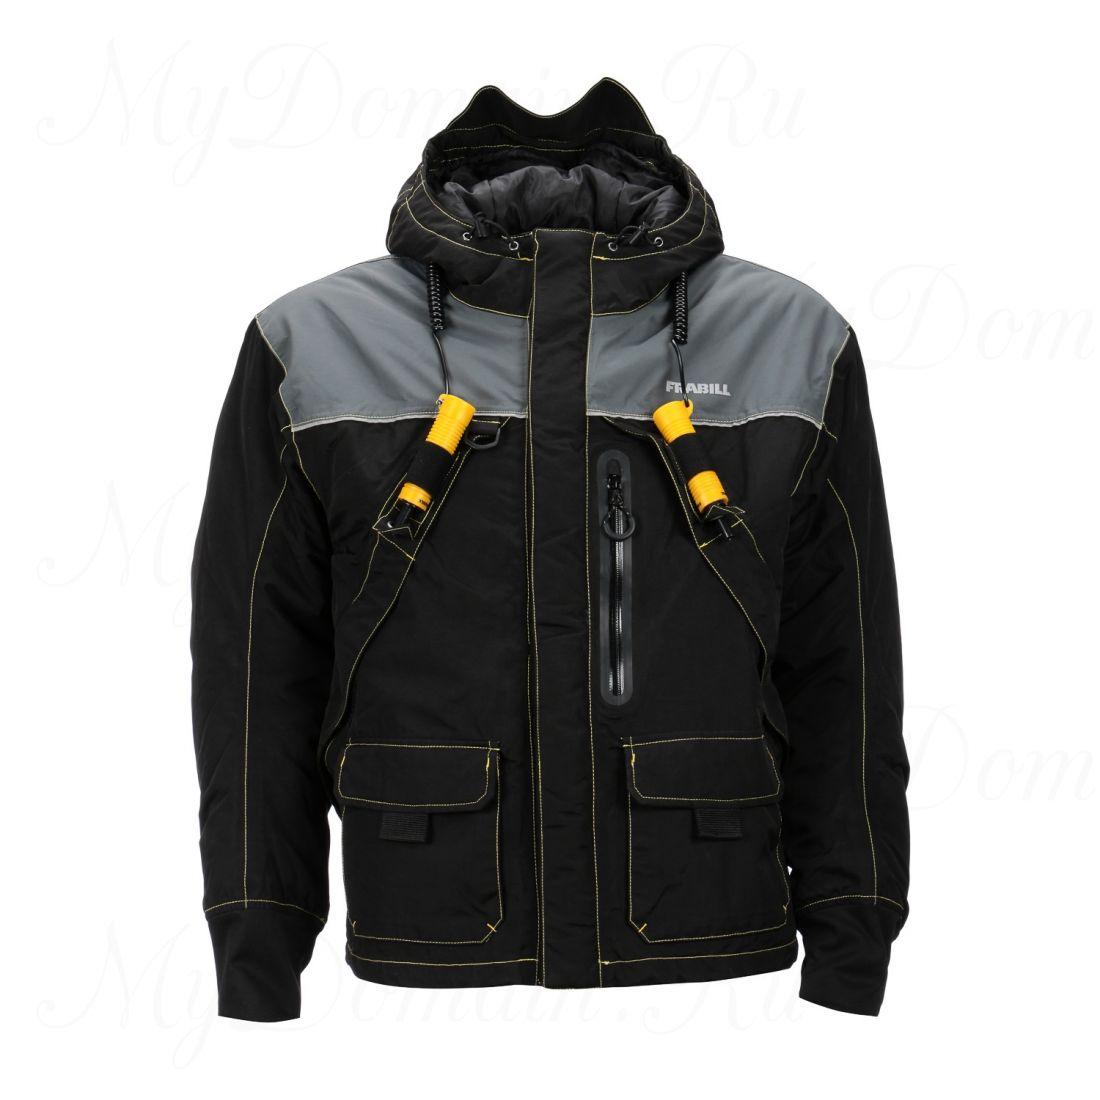 Куртка зимняя Frabill I3 Jacket, Black размер 2XL